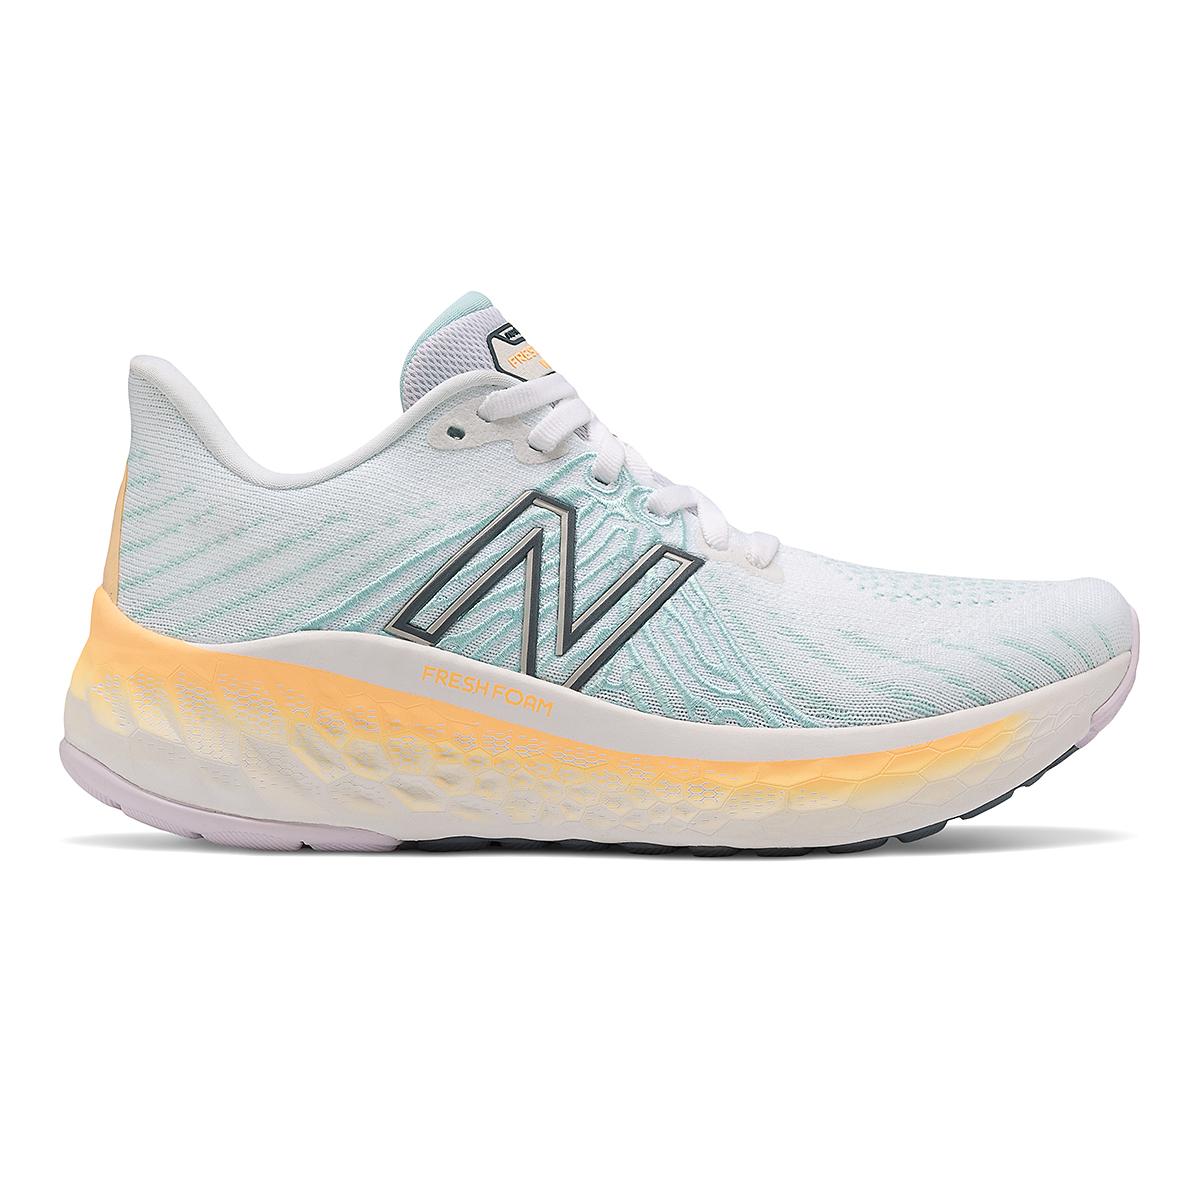 Women's New Balance Fresh Foam Vongo V5 Running Shoe - Color: White/Light Mango - Size: 5 - Width: Regular, White/Light Mango, large, image 1